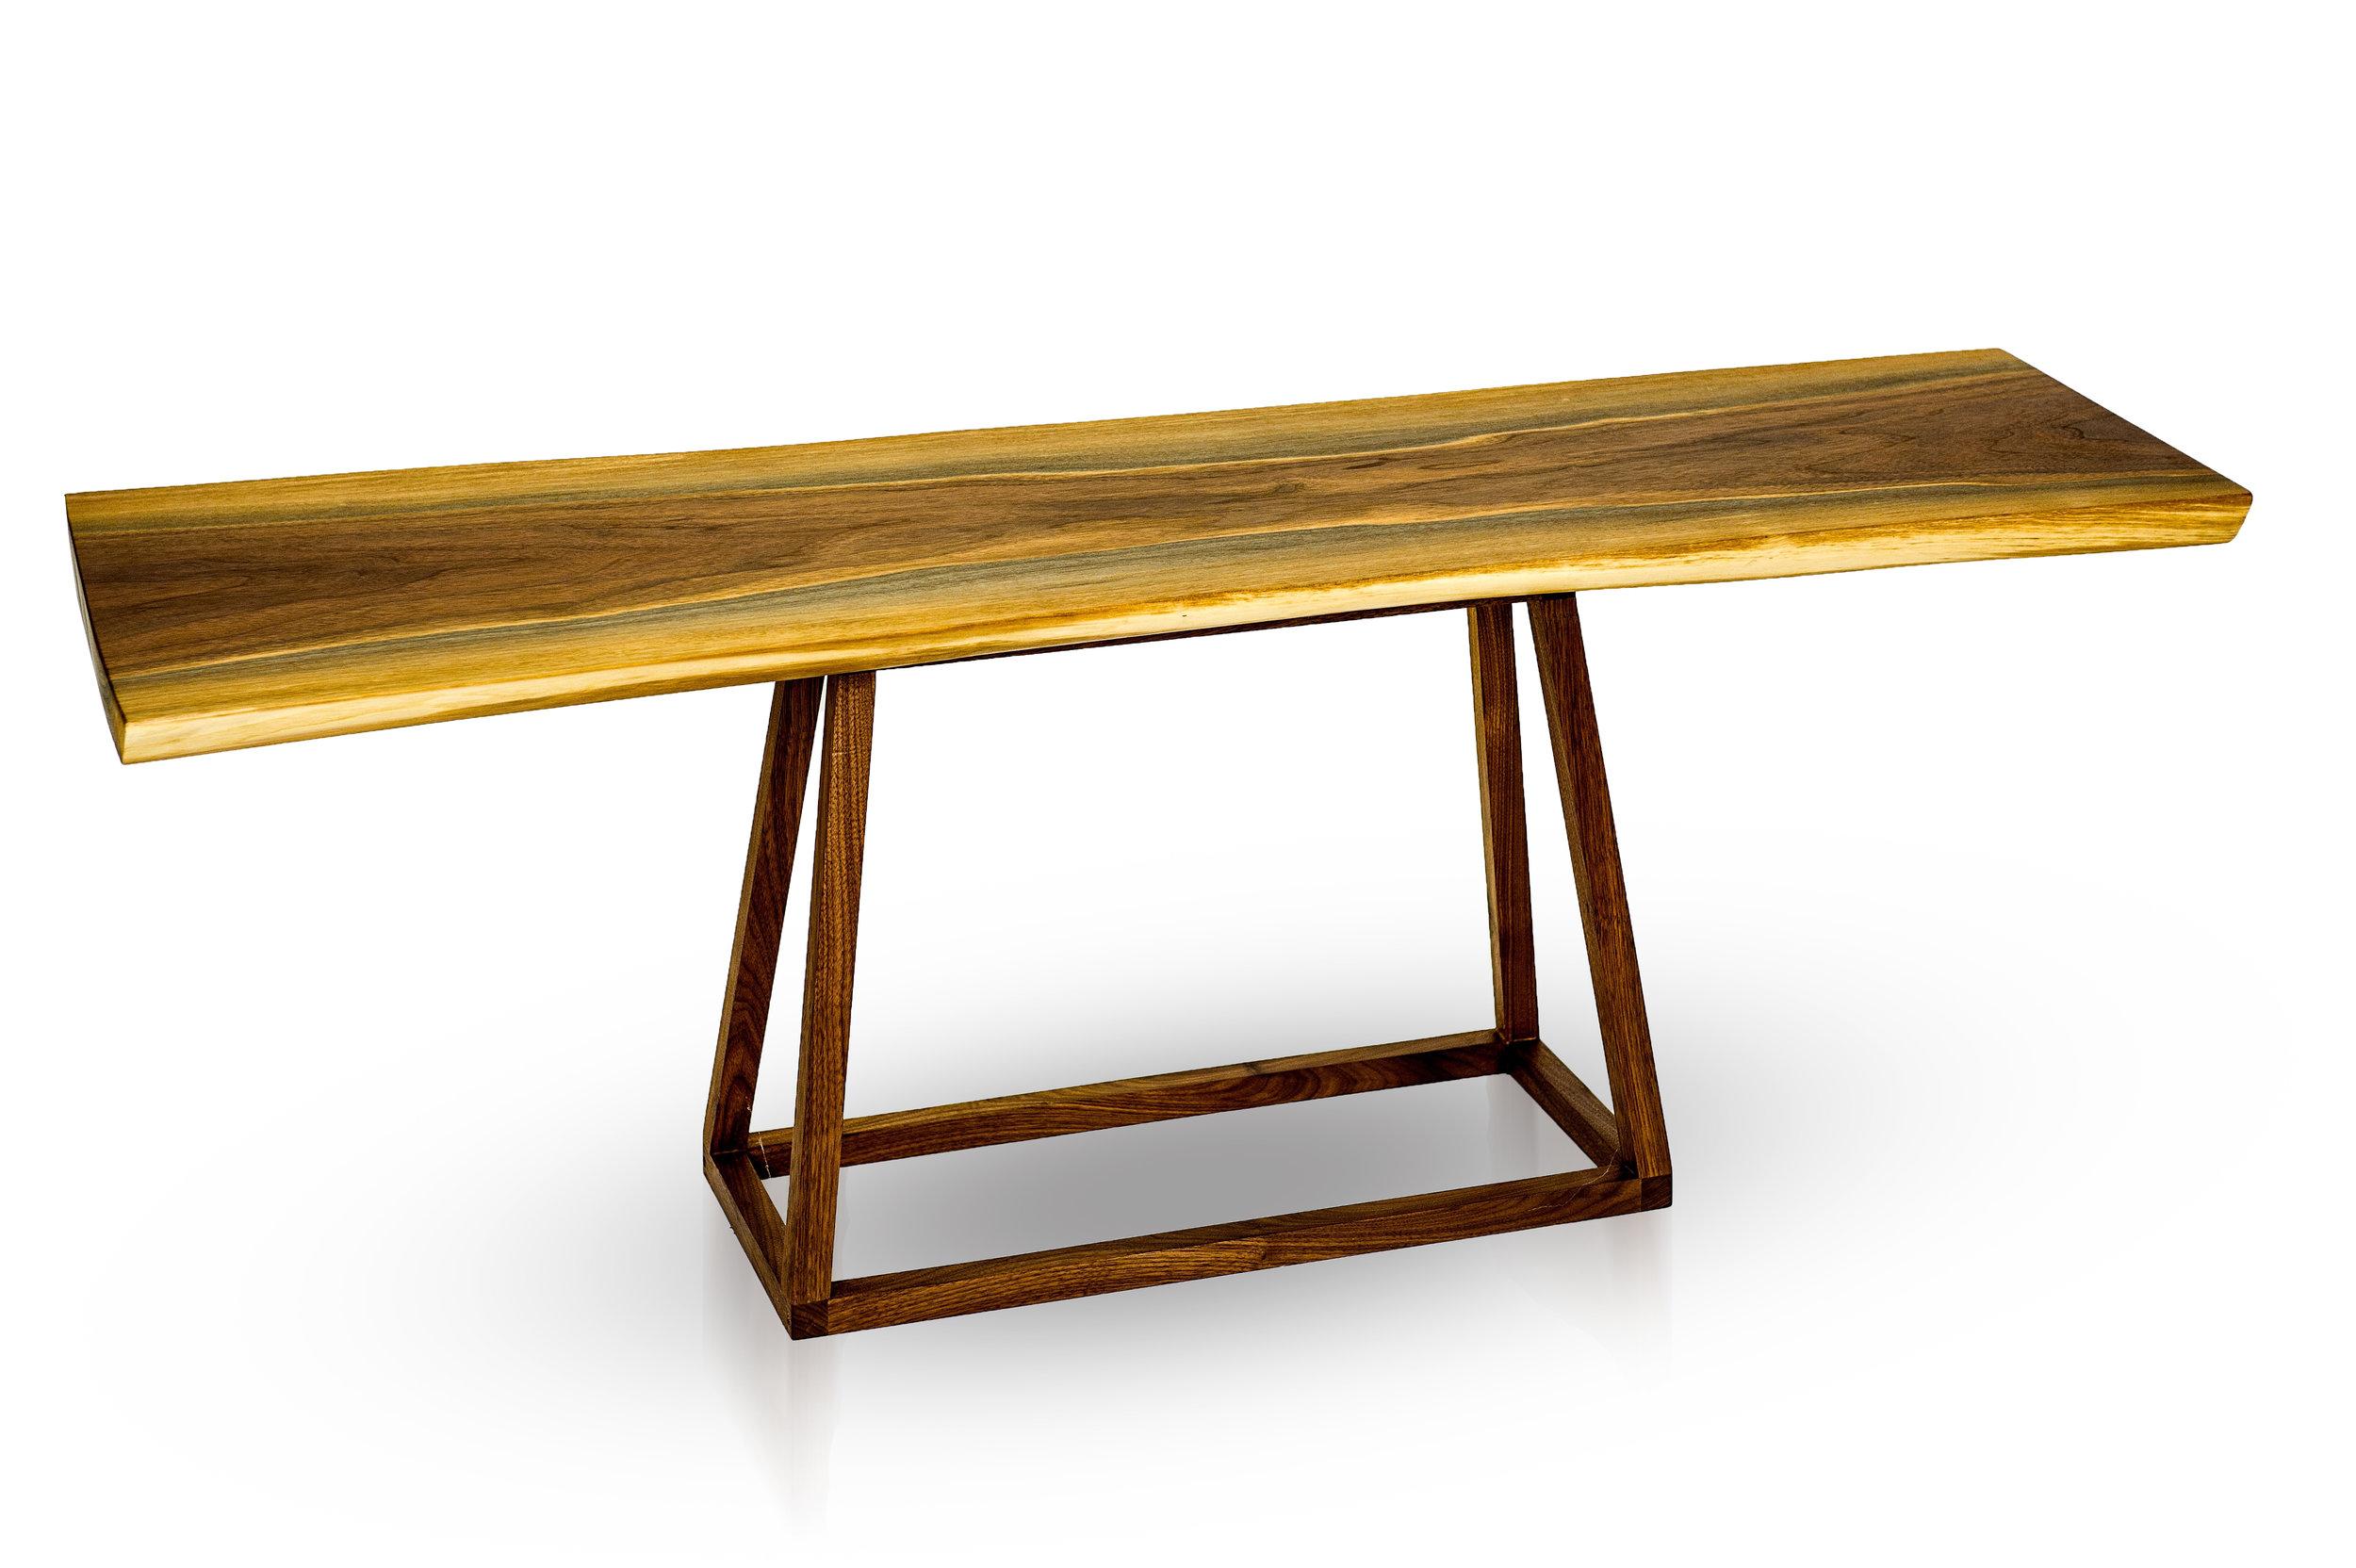 Slab_Coffee_Table_Photo_1.jpg